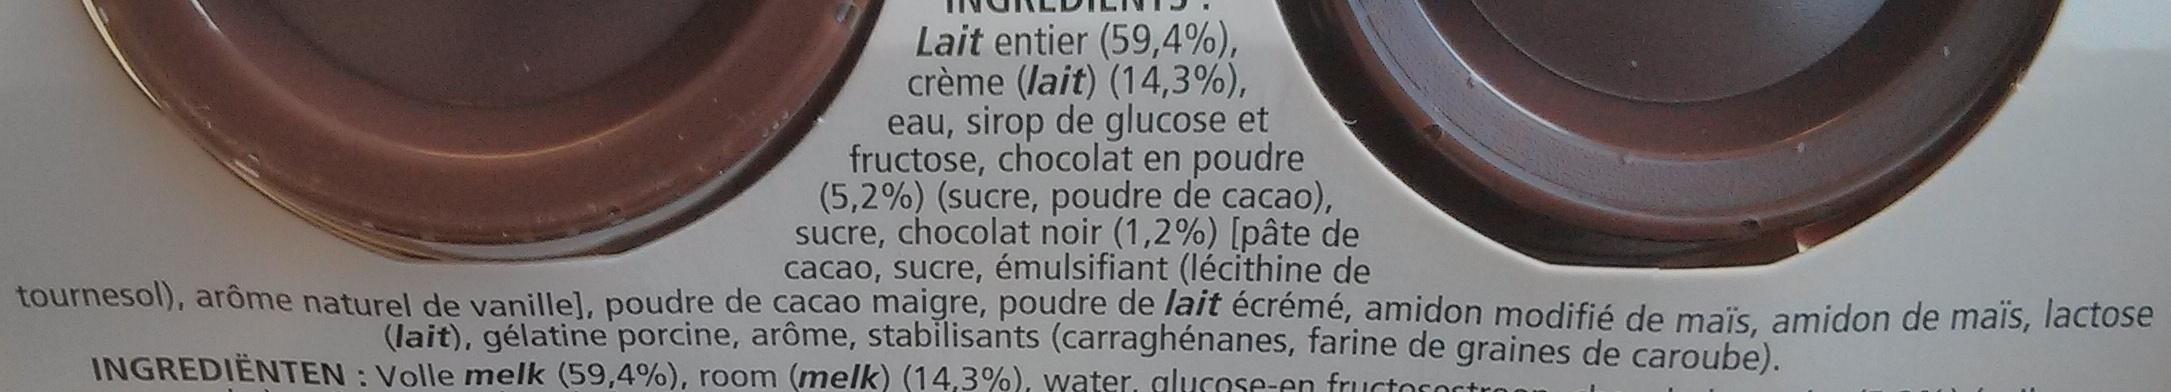 Le Viennois chocolat - Ingrediënten